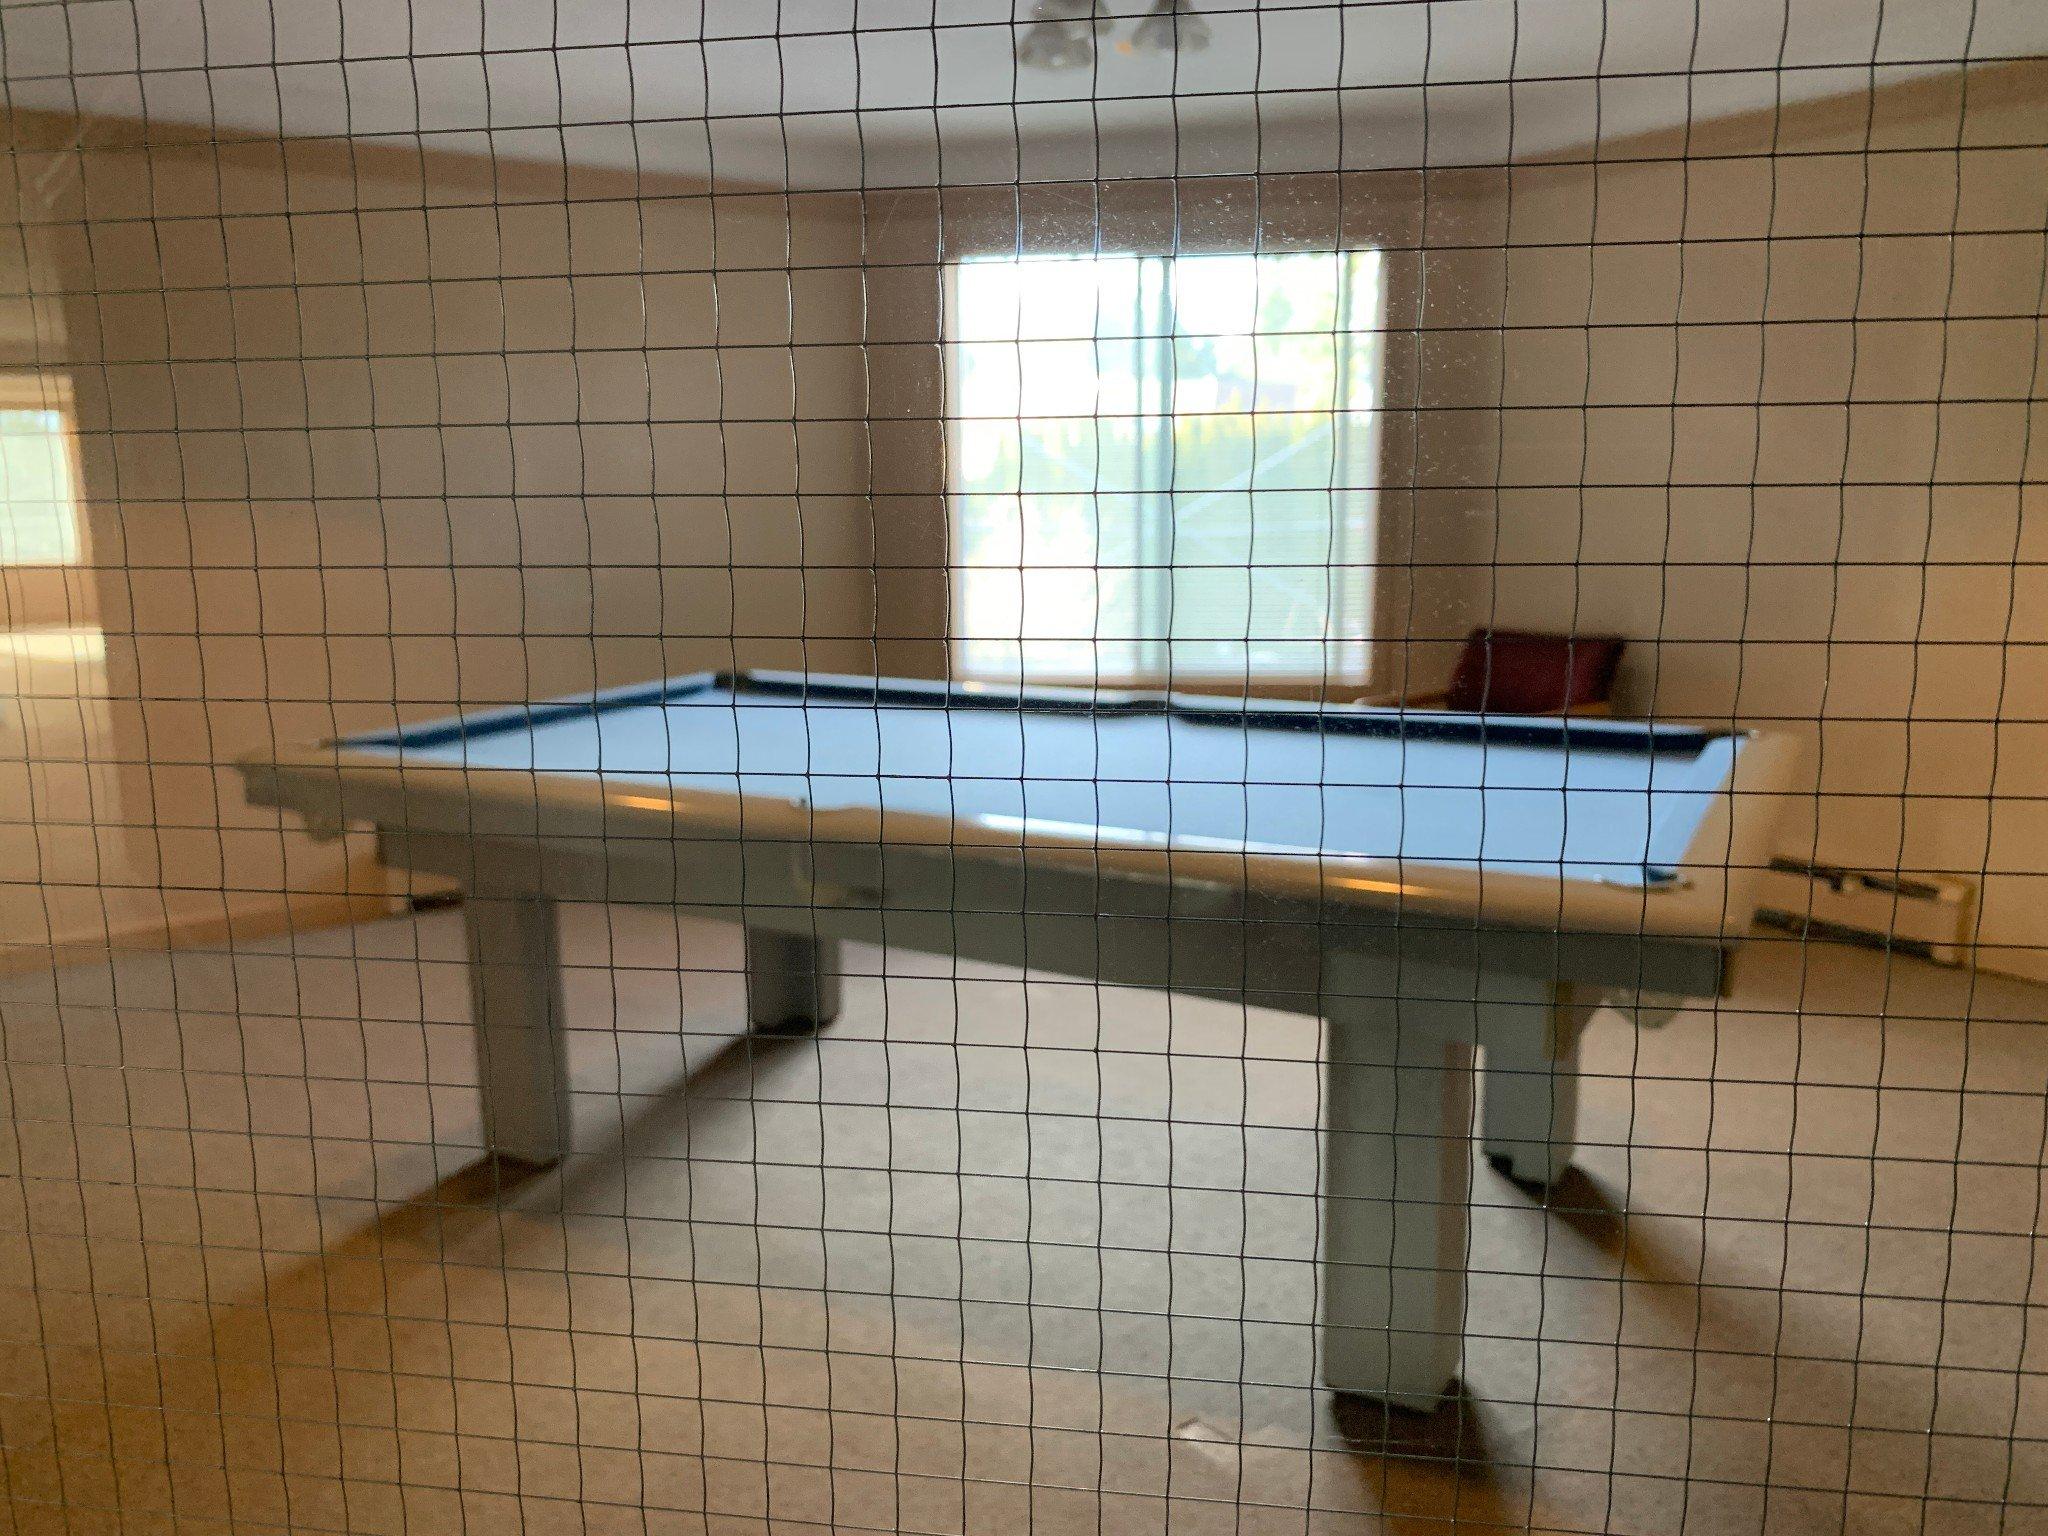 Photo 13: Photos: #510 2700 McCallum Rd. in Abbotsford: Central Abbotsford Condo for rent